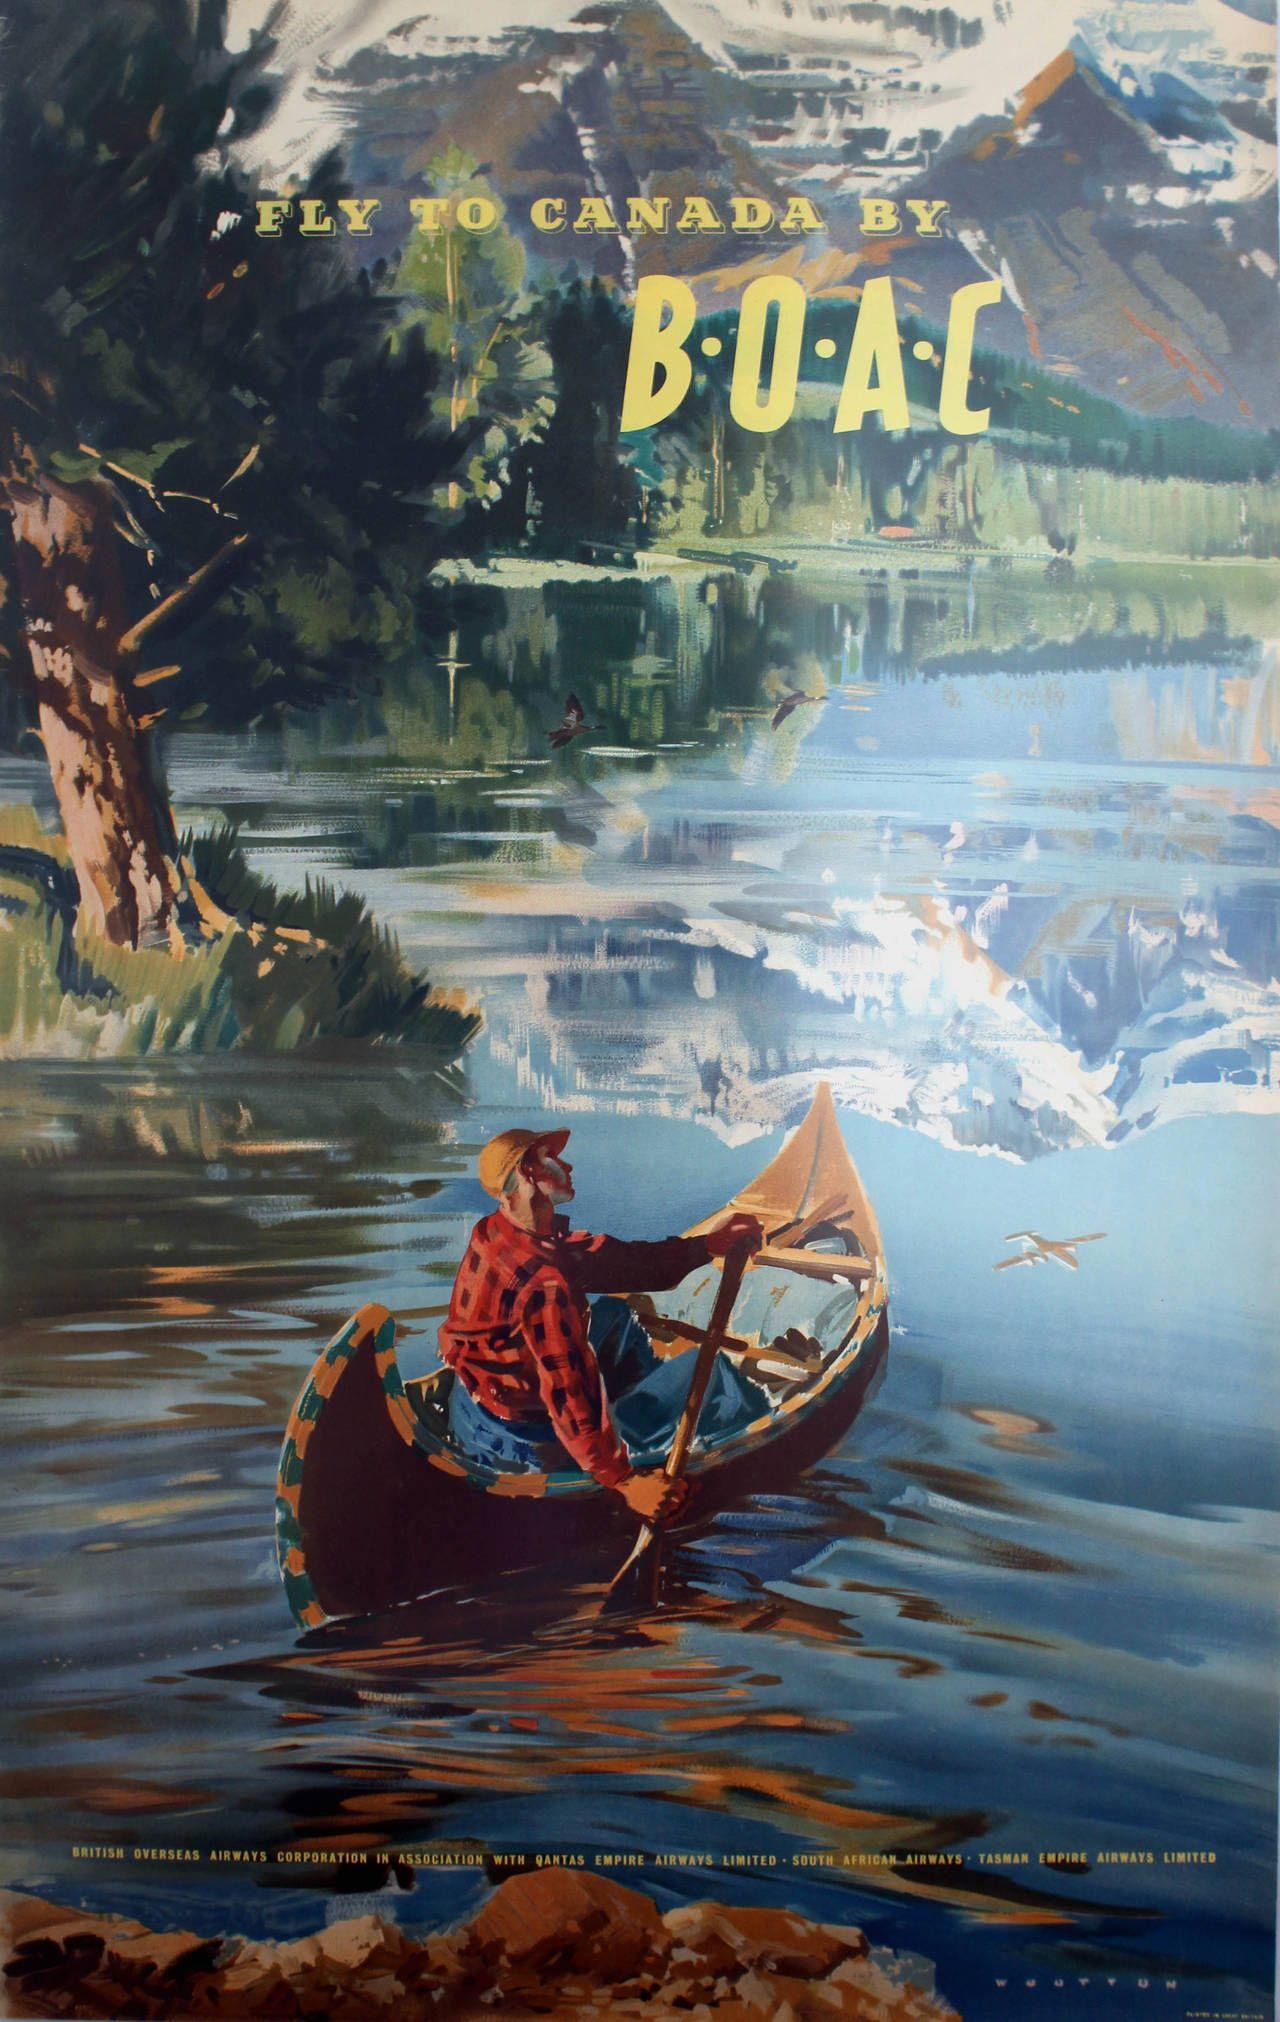 Frank wootton original vintage travel advertising poster